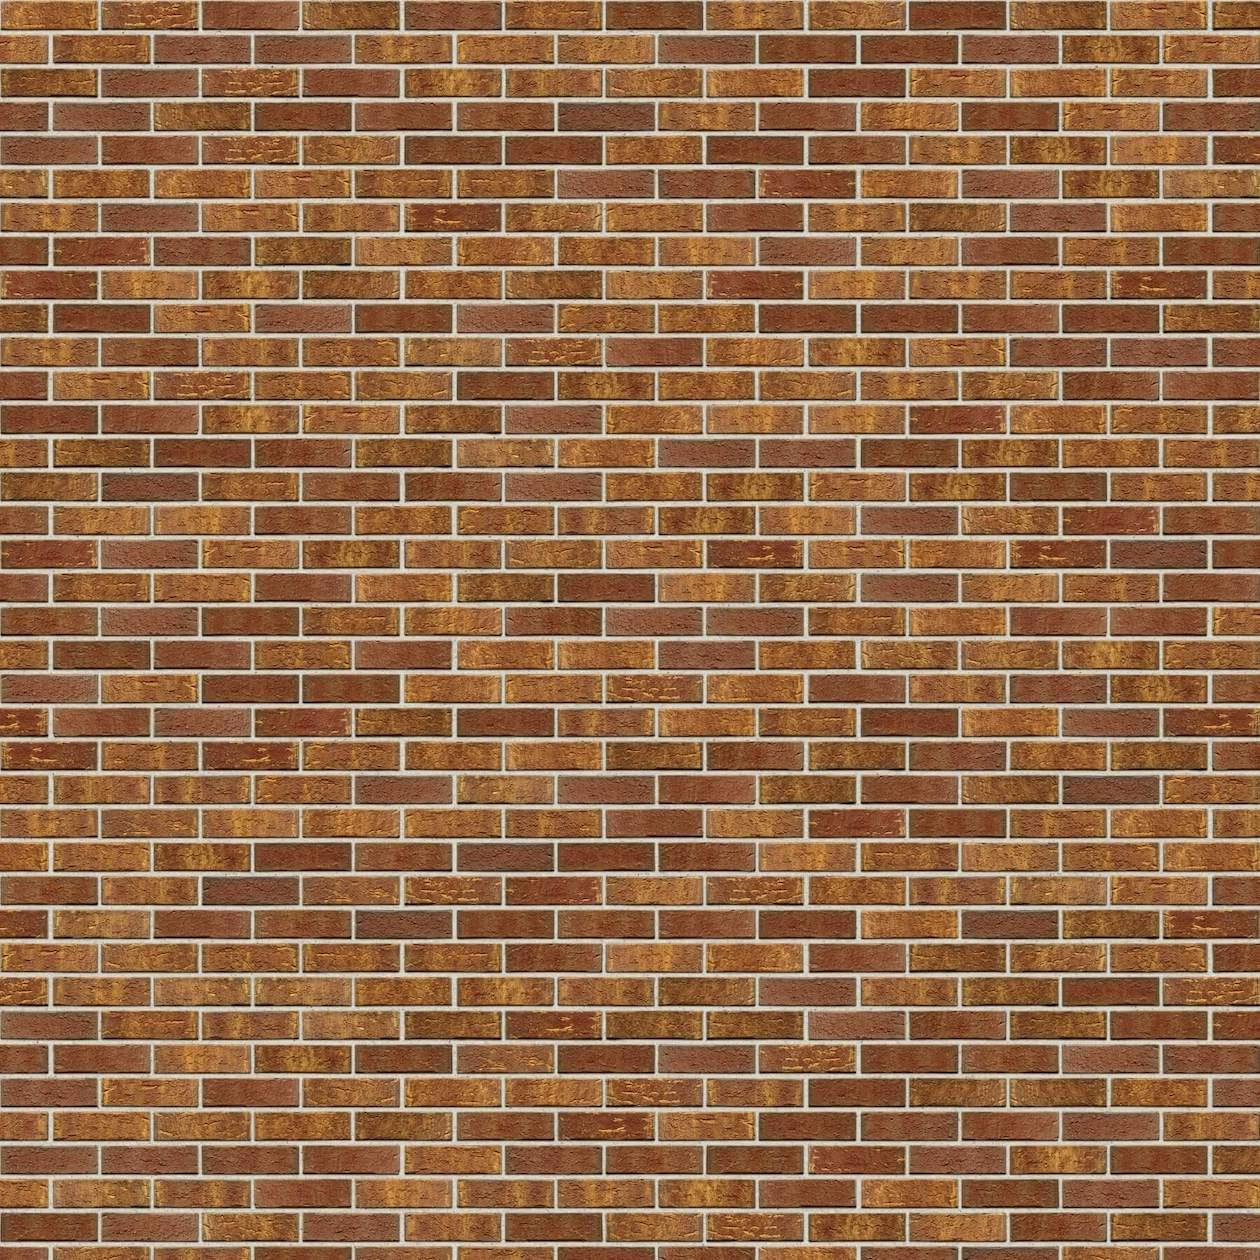 Puna-cigla-FeldHaus-Klinker-brick-house-nf-k-686-Bela Fuga